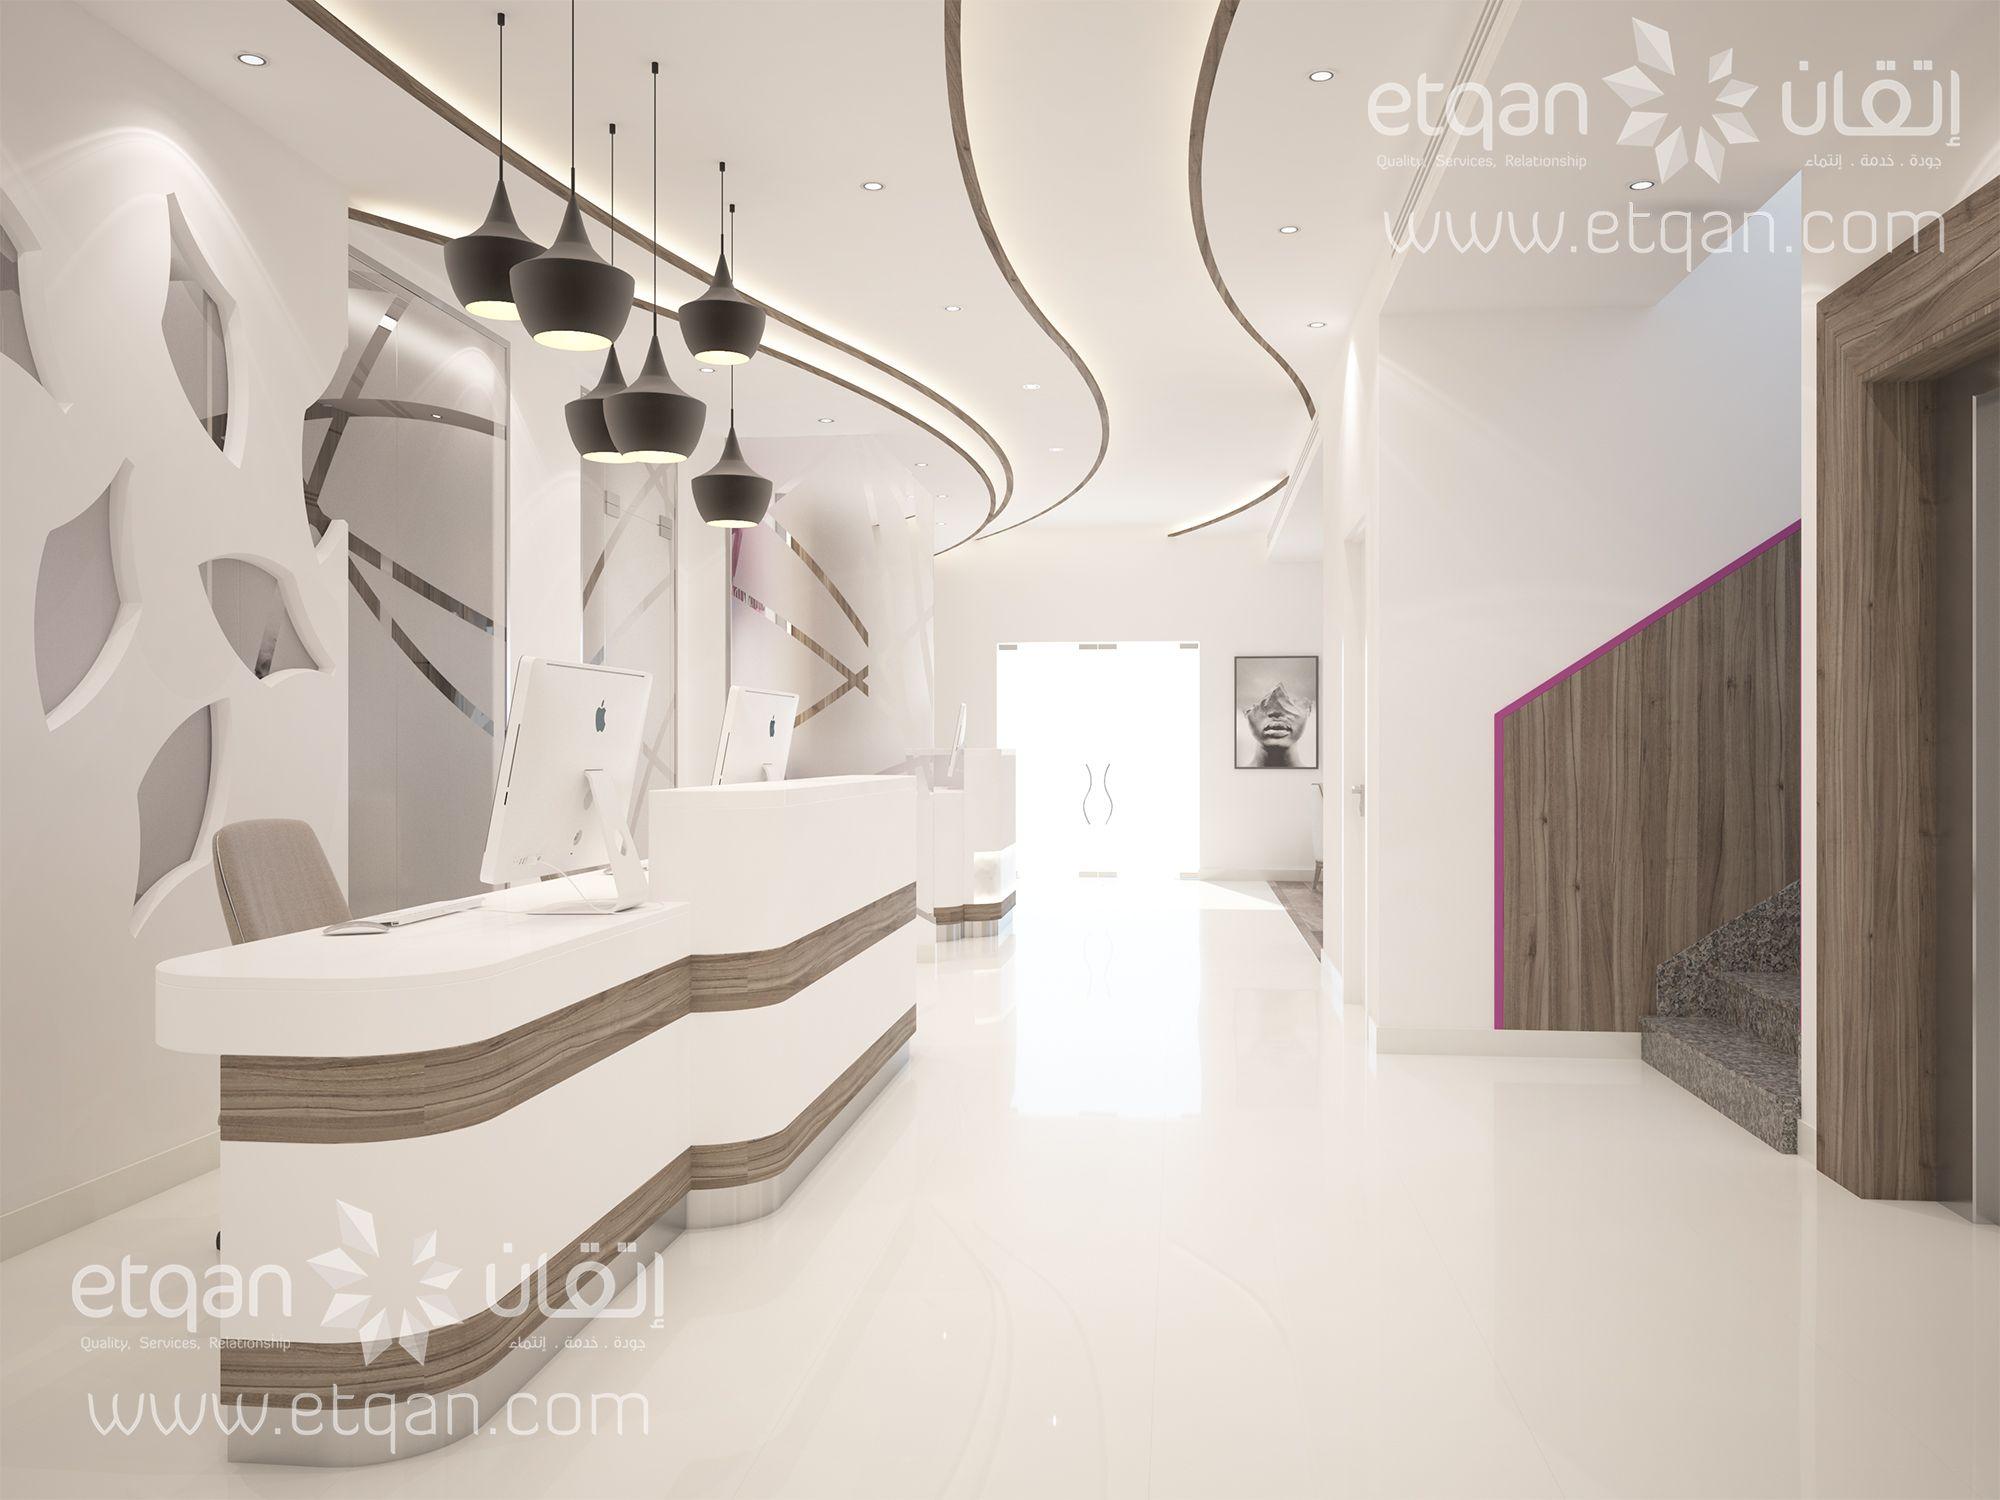 Whatsapp 968 95043444 Landline 22347058 Youtube Etqan Design Instagram Etqan Www Etqan Com Design Home Decor Home